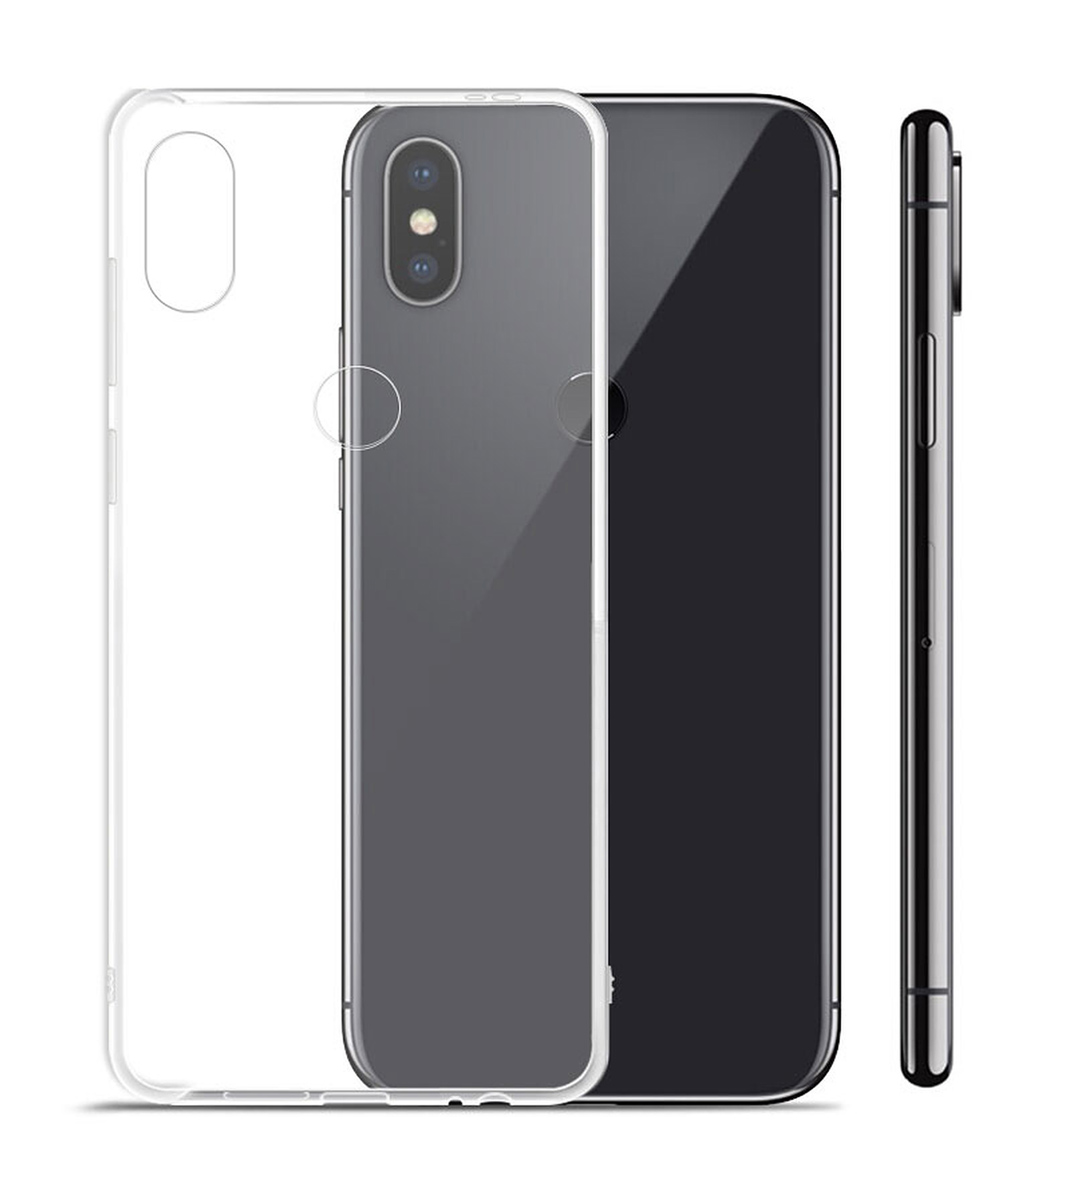 POWERTECH Θήκη Ultra Slim για Xiaomi Redmi S2, διάφανη - POWERTECH 22211